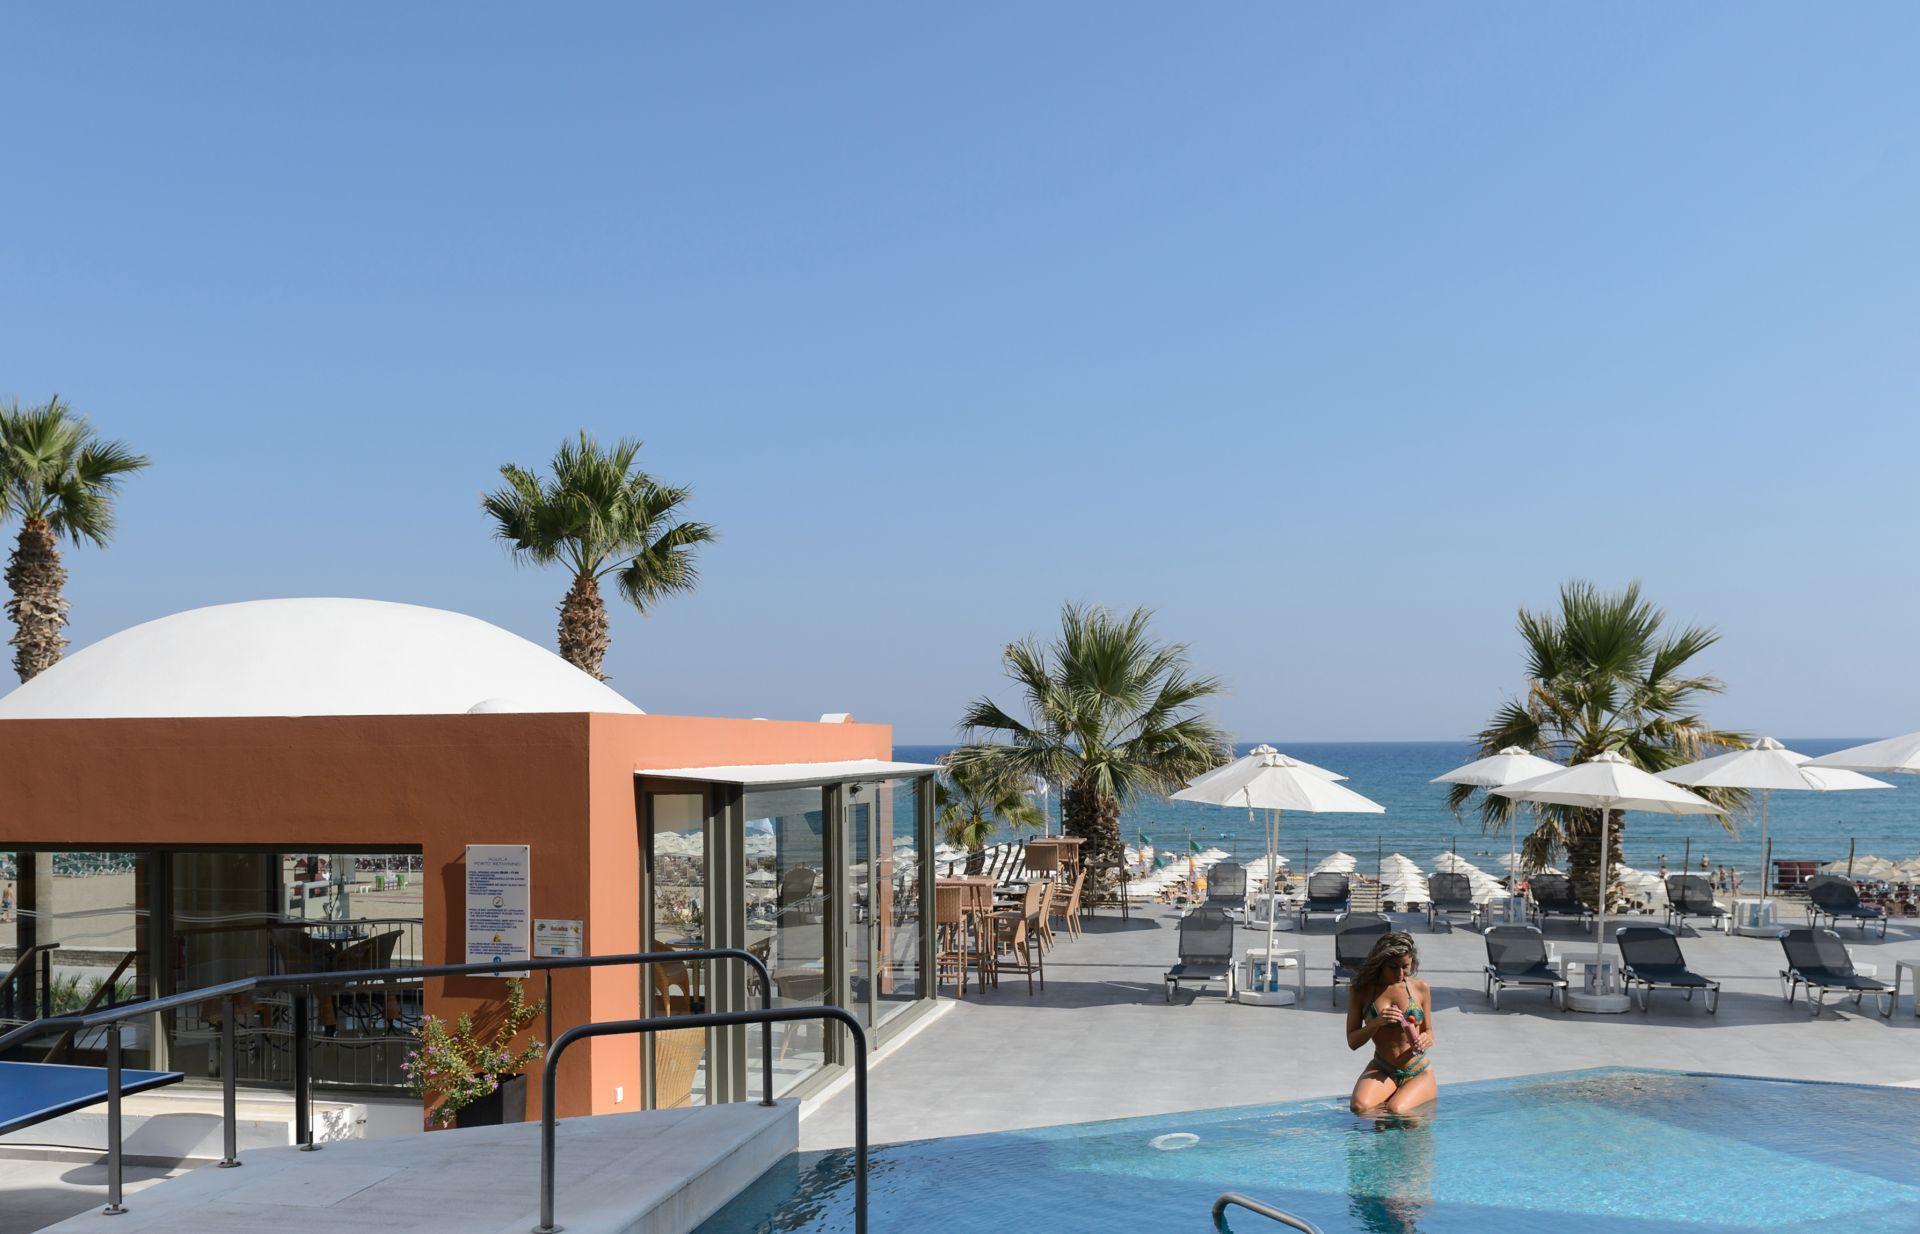 Aquila Porto Rethymno Hotel Deck Pool Hotels In Crete Aquila Hotels Resorts